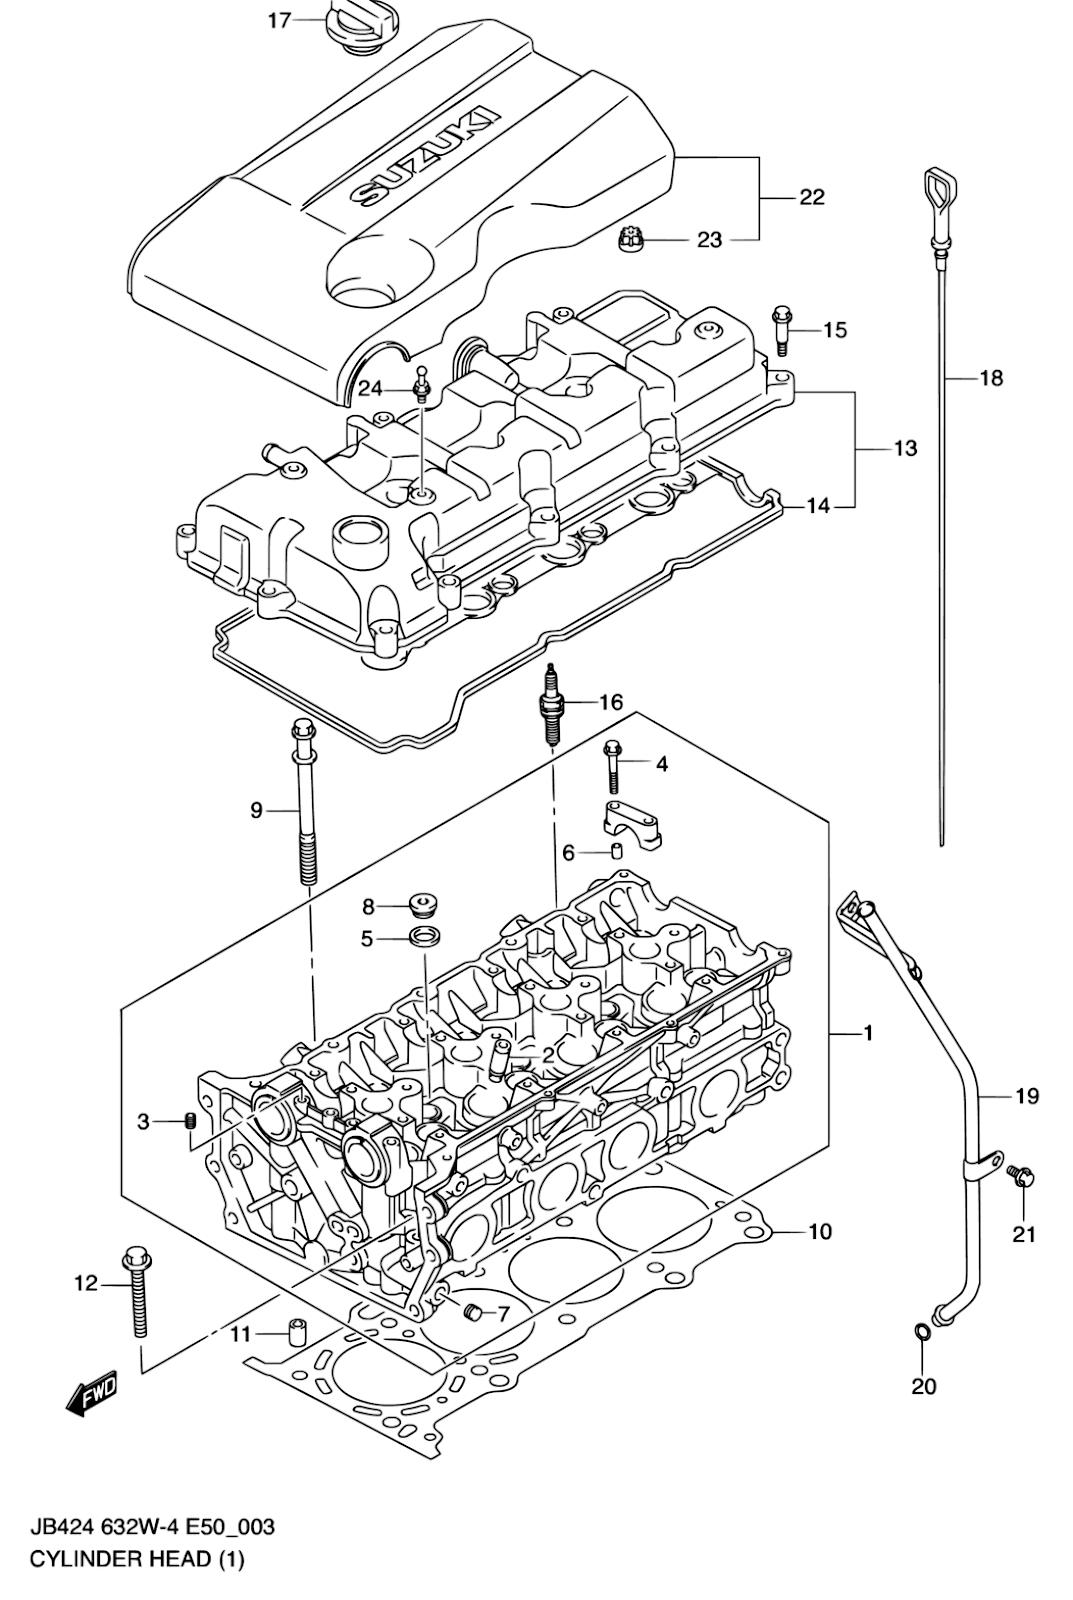 Suzuki Grand Vitara Wiring Diagram